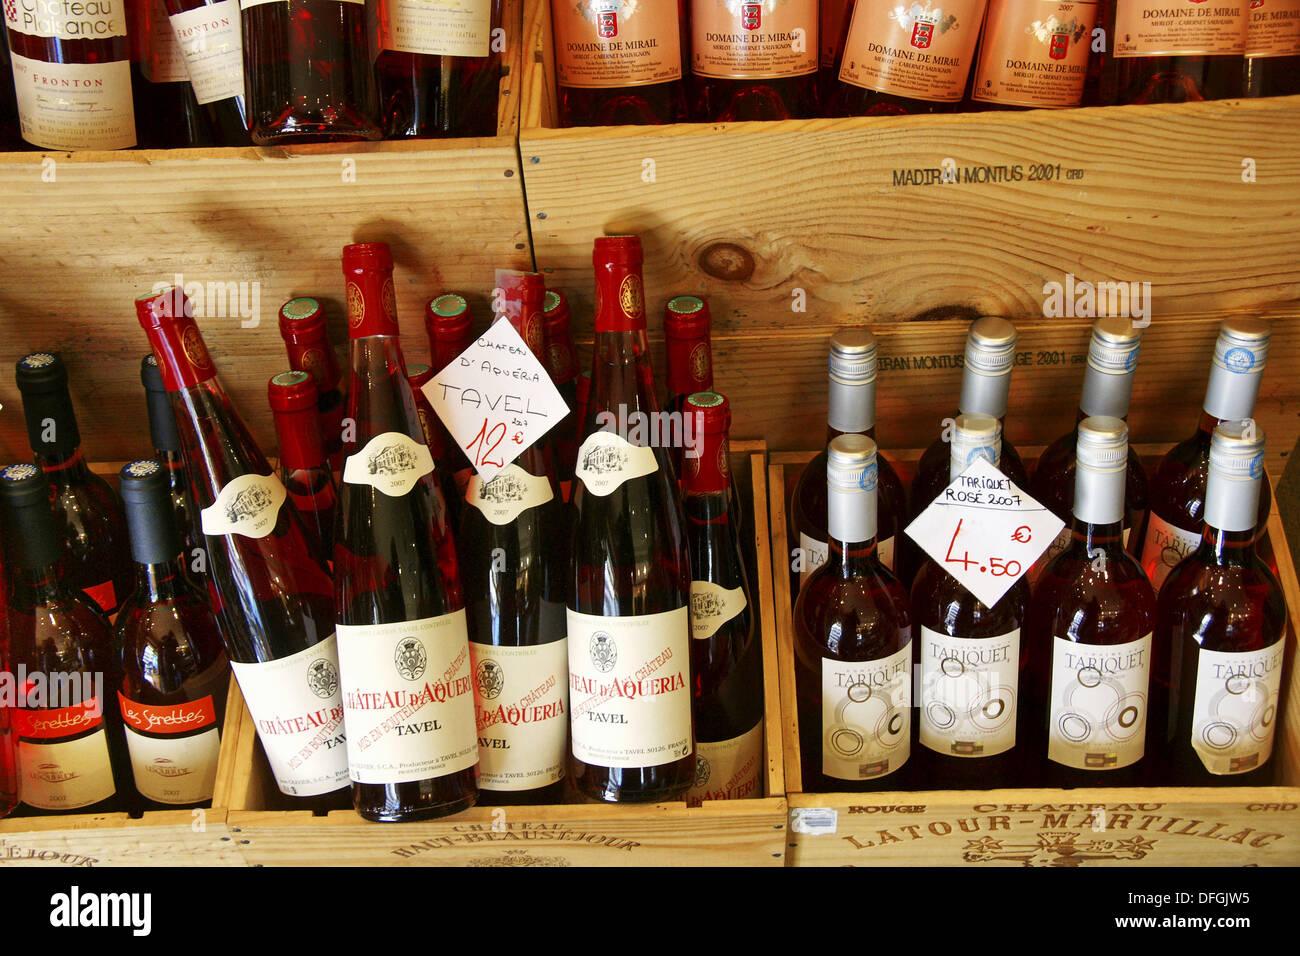 Diversi vini francesi (Tavel, Tariquet, ecc.), Francia Immagini Stock